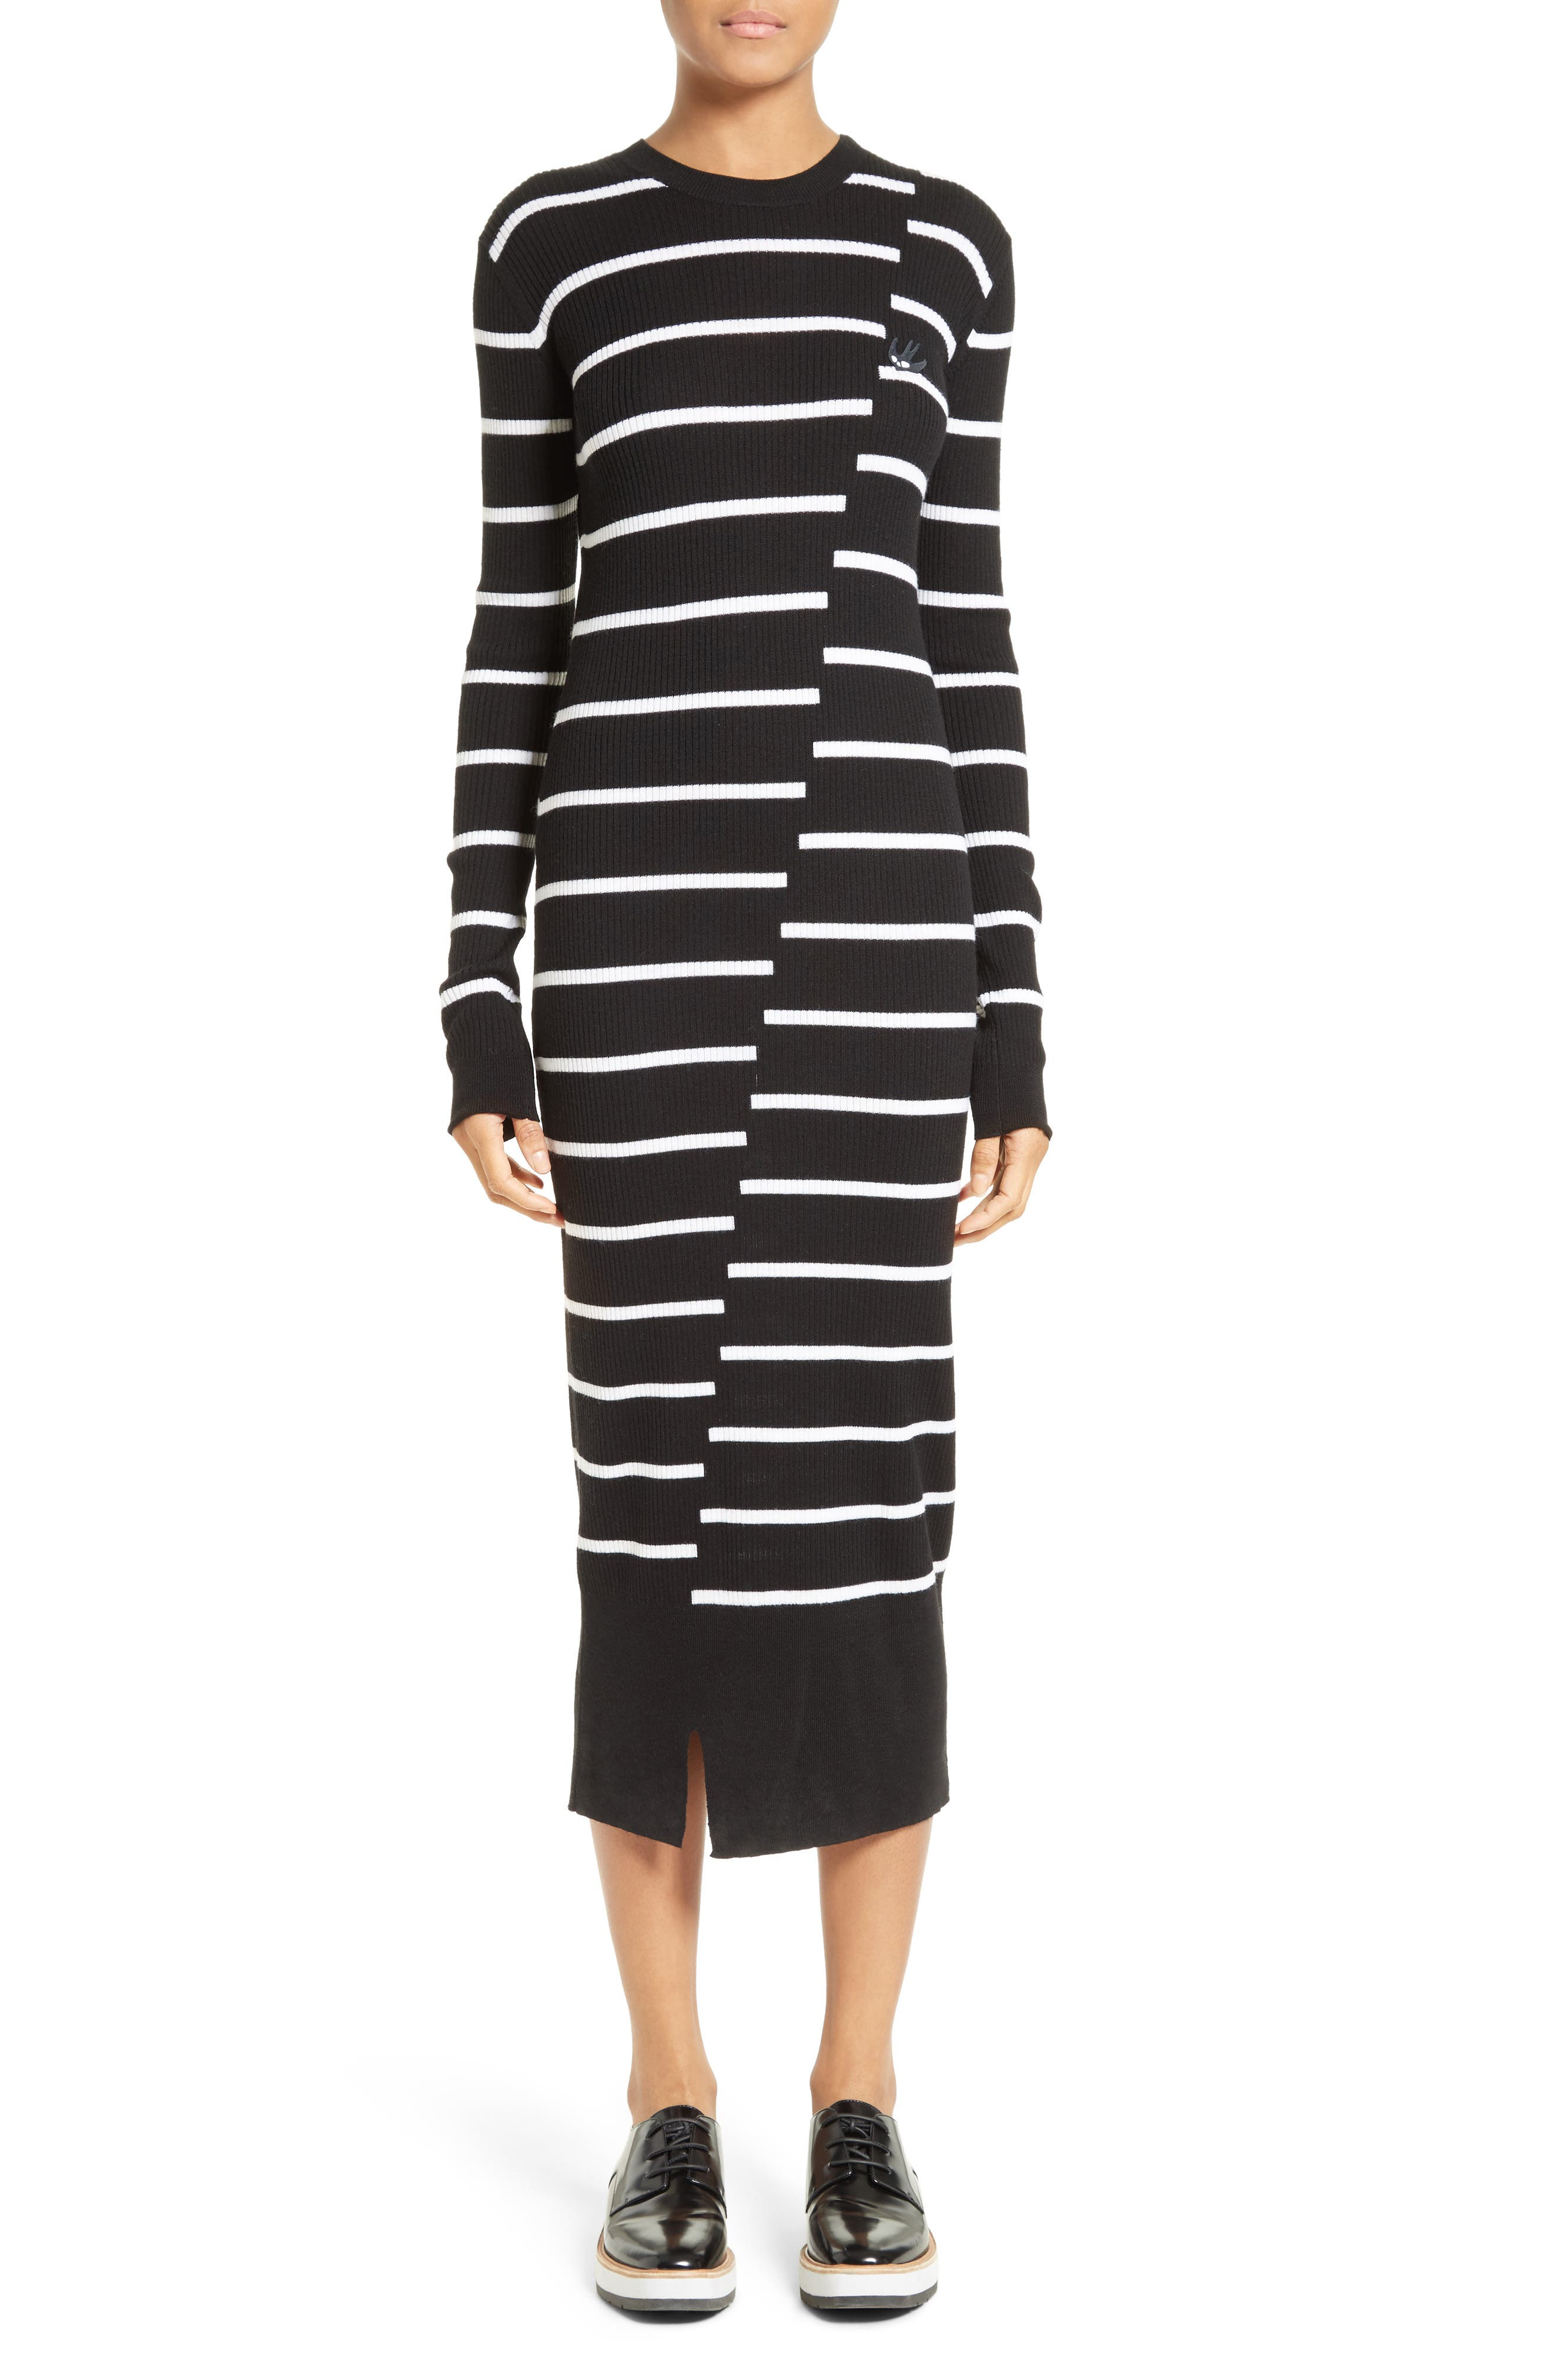 McQ Alexander McQueen Distort Stripe Wool Sweater Dress